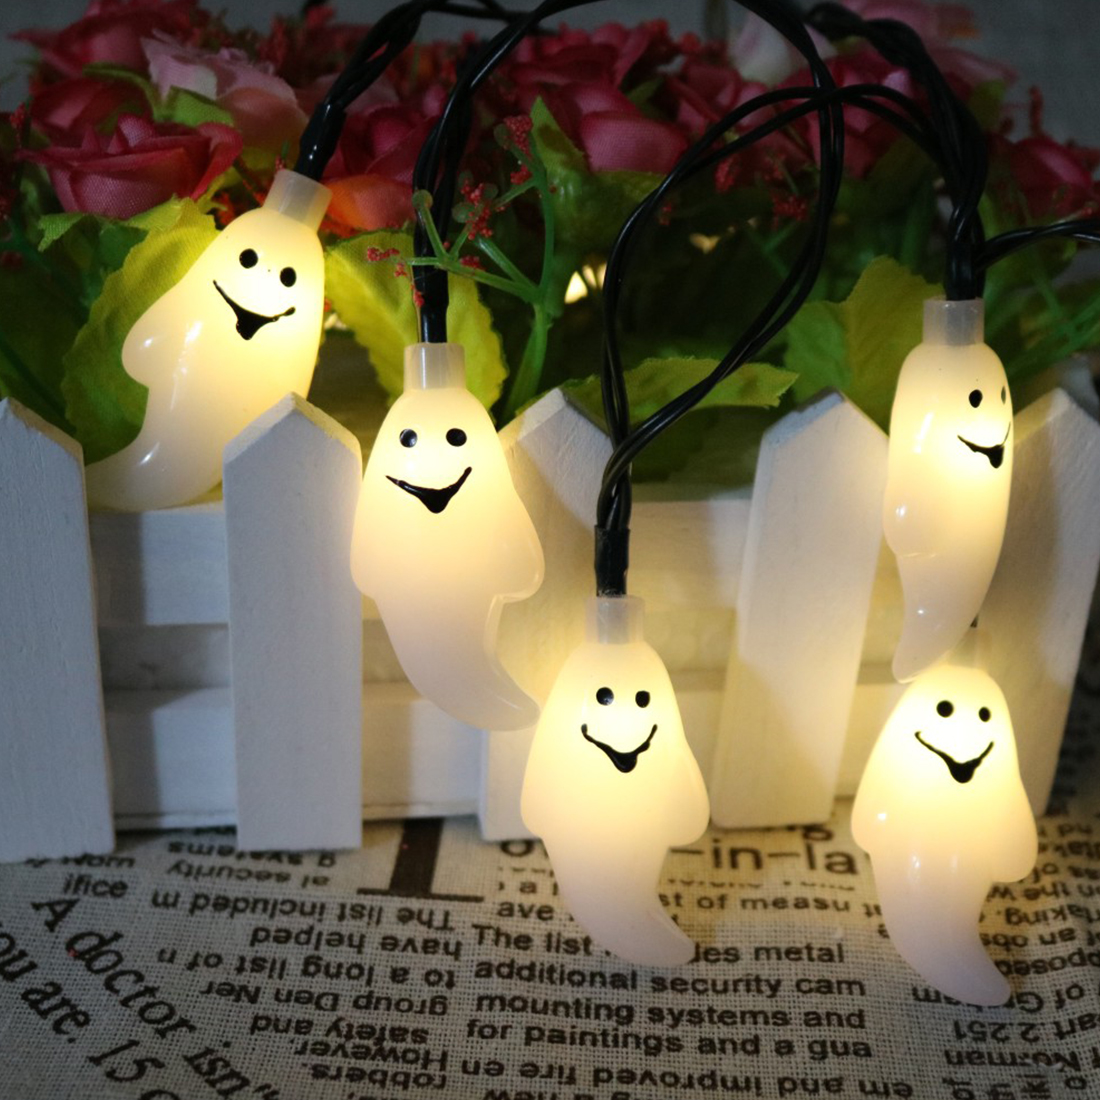 new new 10 led 15m halloween decor ghost led string lights lanterns lamp for diy home bar outdoor party supplies - Outdoor Party Supplies